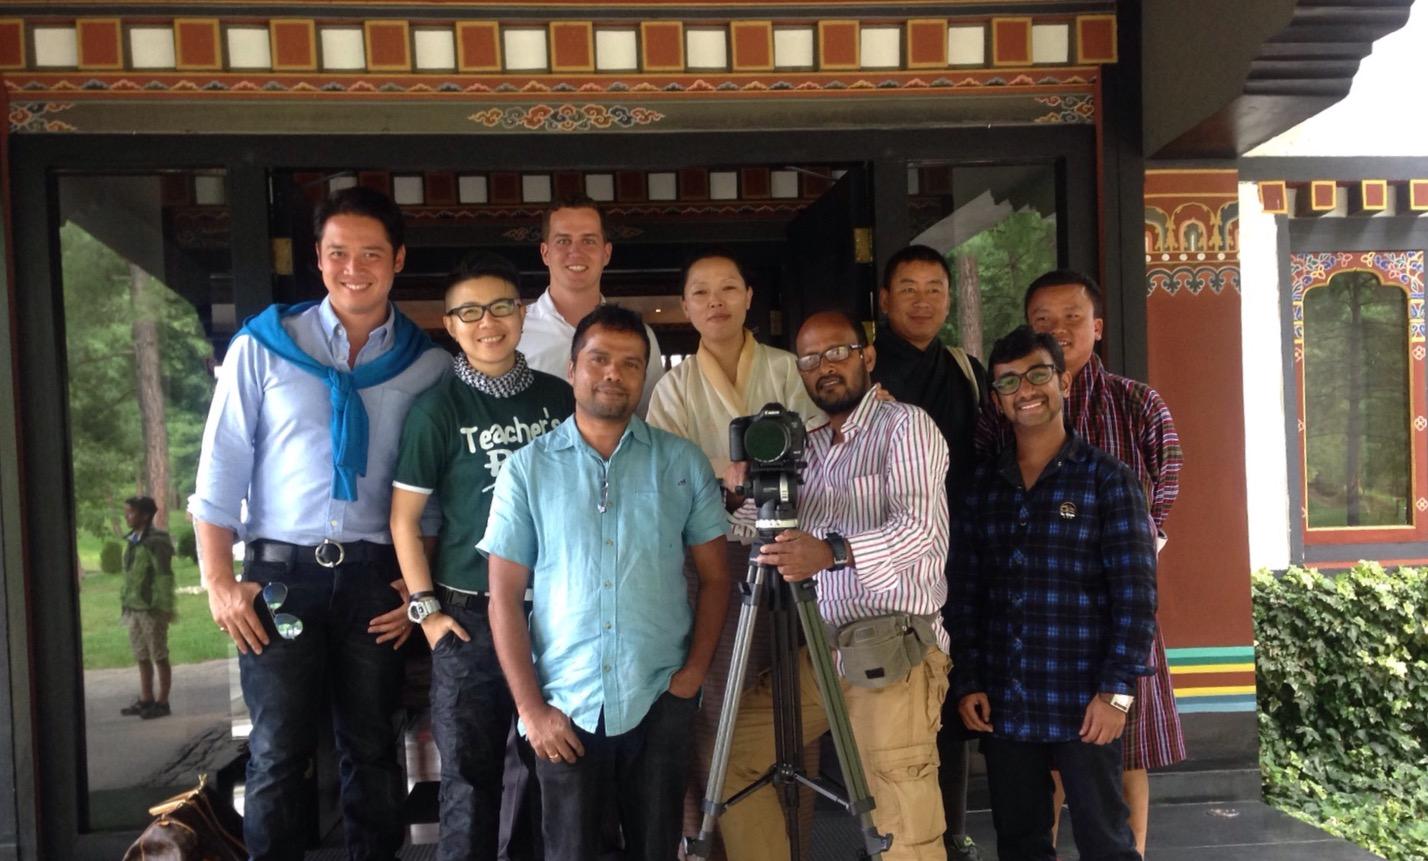 The entire crew of City Time Travellers 2 on the set at Uma Paro, Paro, Bhutan